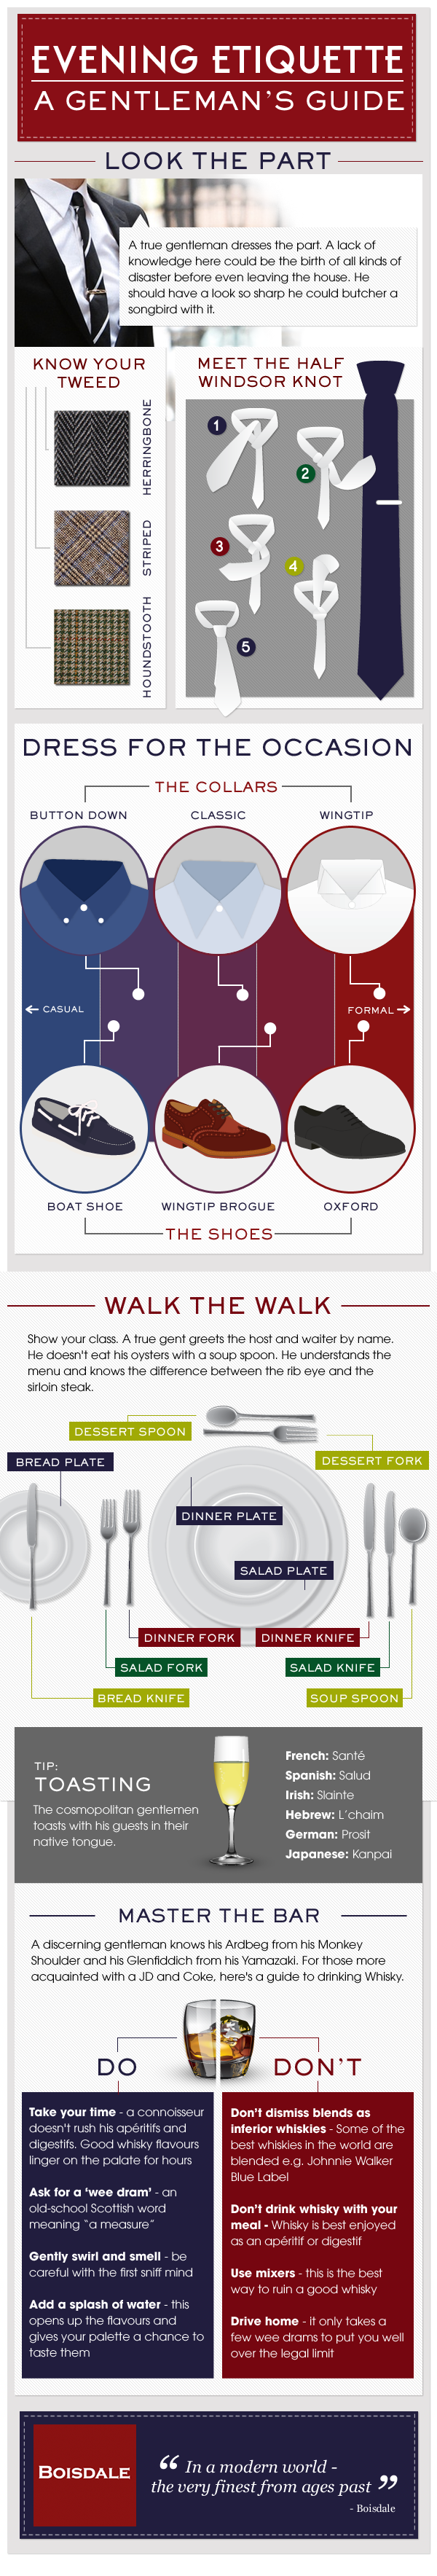 Evening Etiquette: A Gentleman's Guide infographic